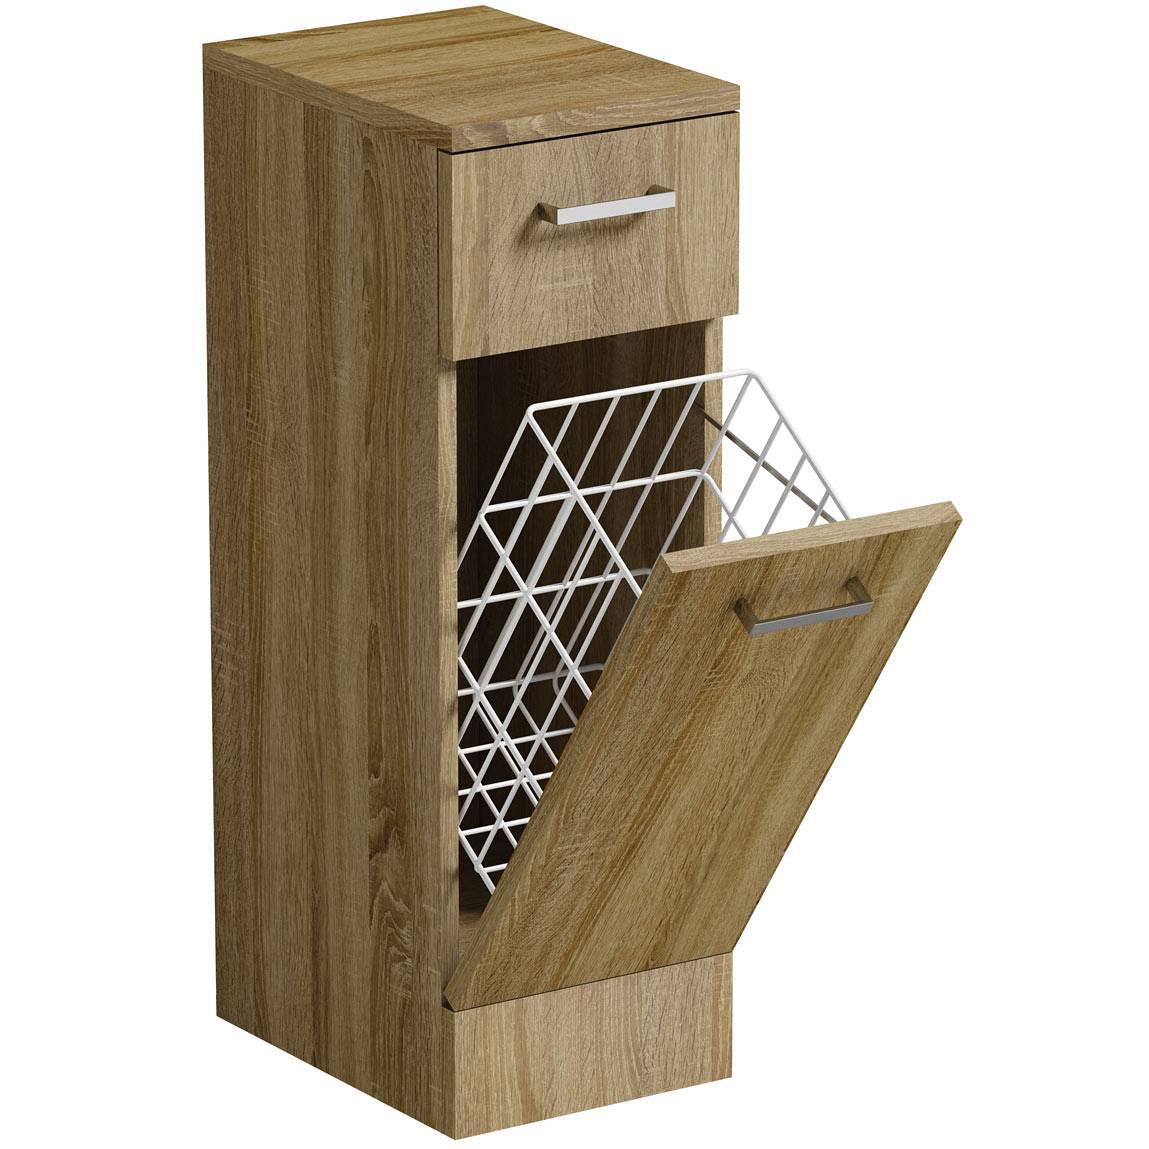 Image of Sienna Oak Linen Basket 330